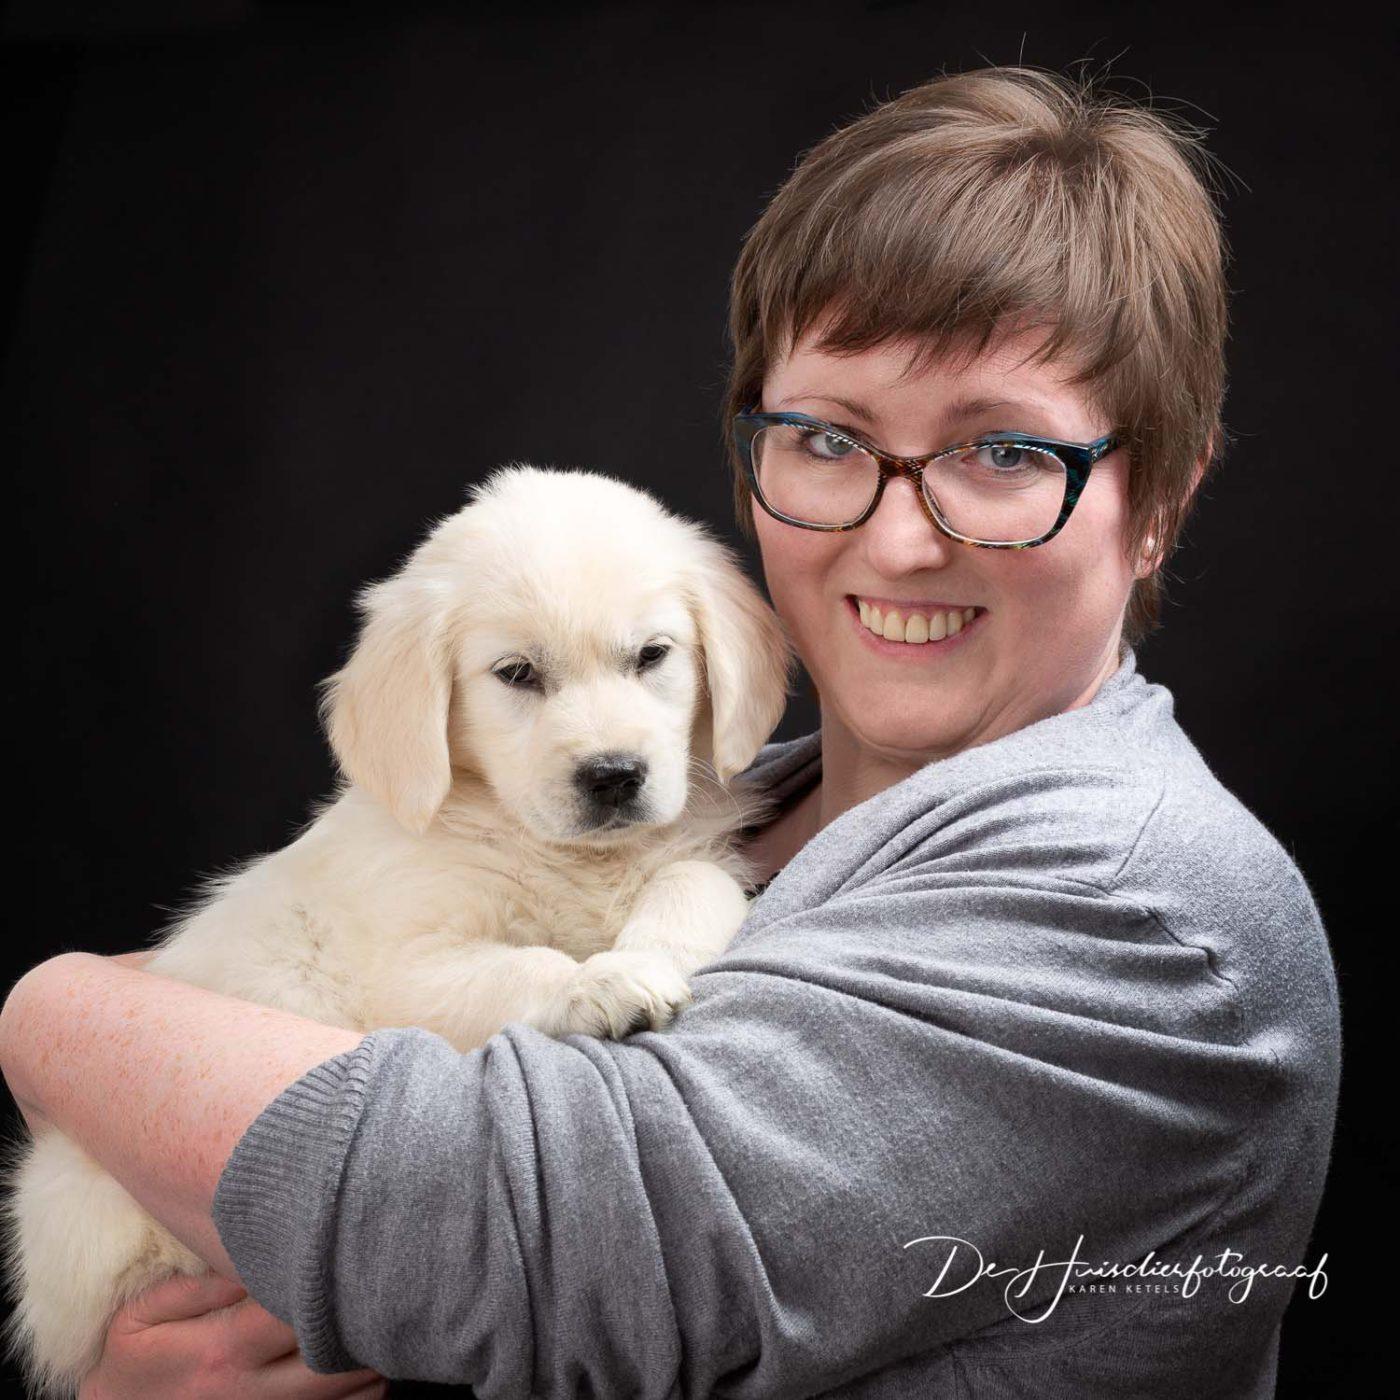 Photographer Karen Ketels with golden retriever puppy Hebe